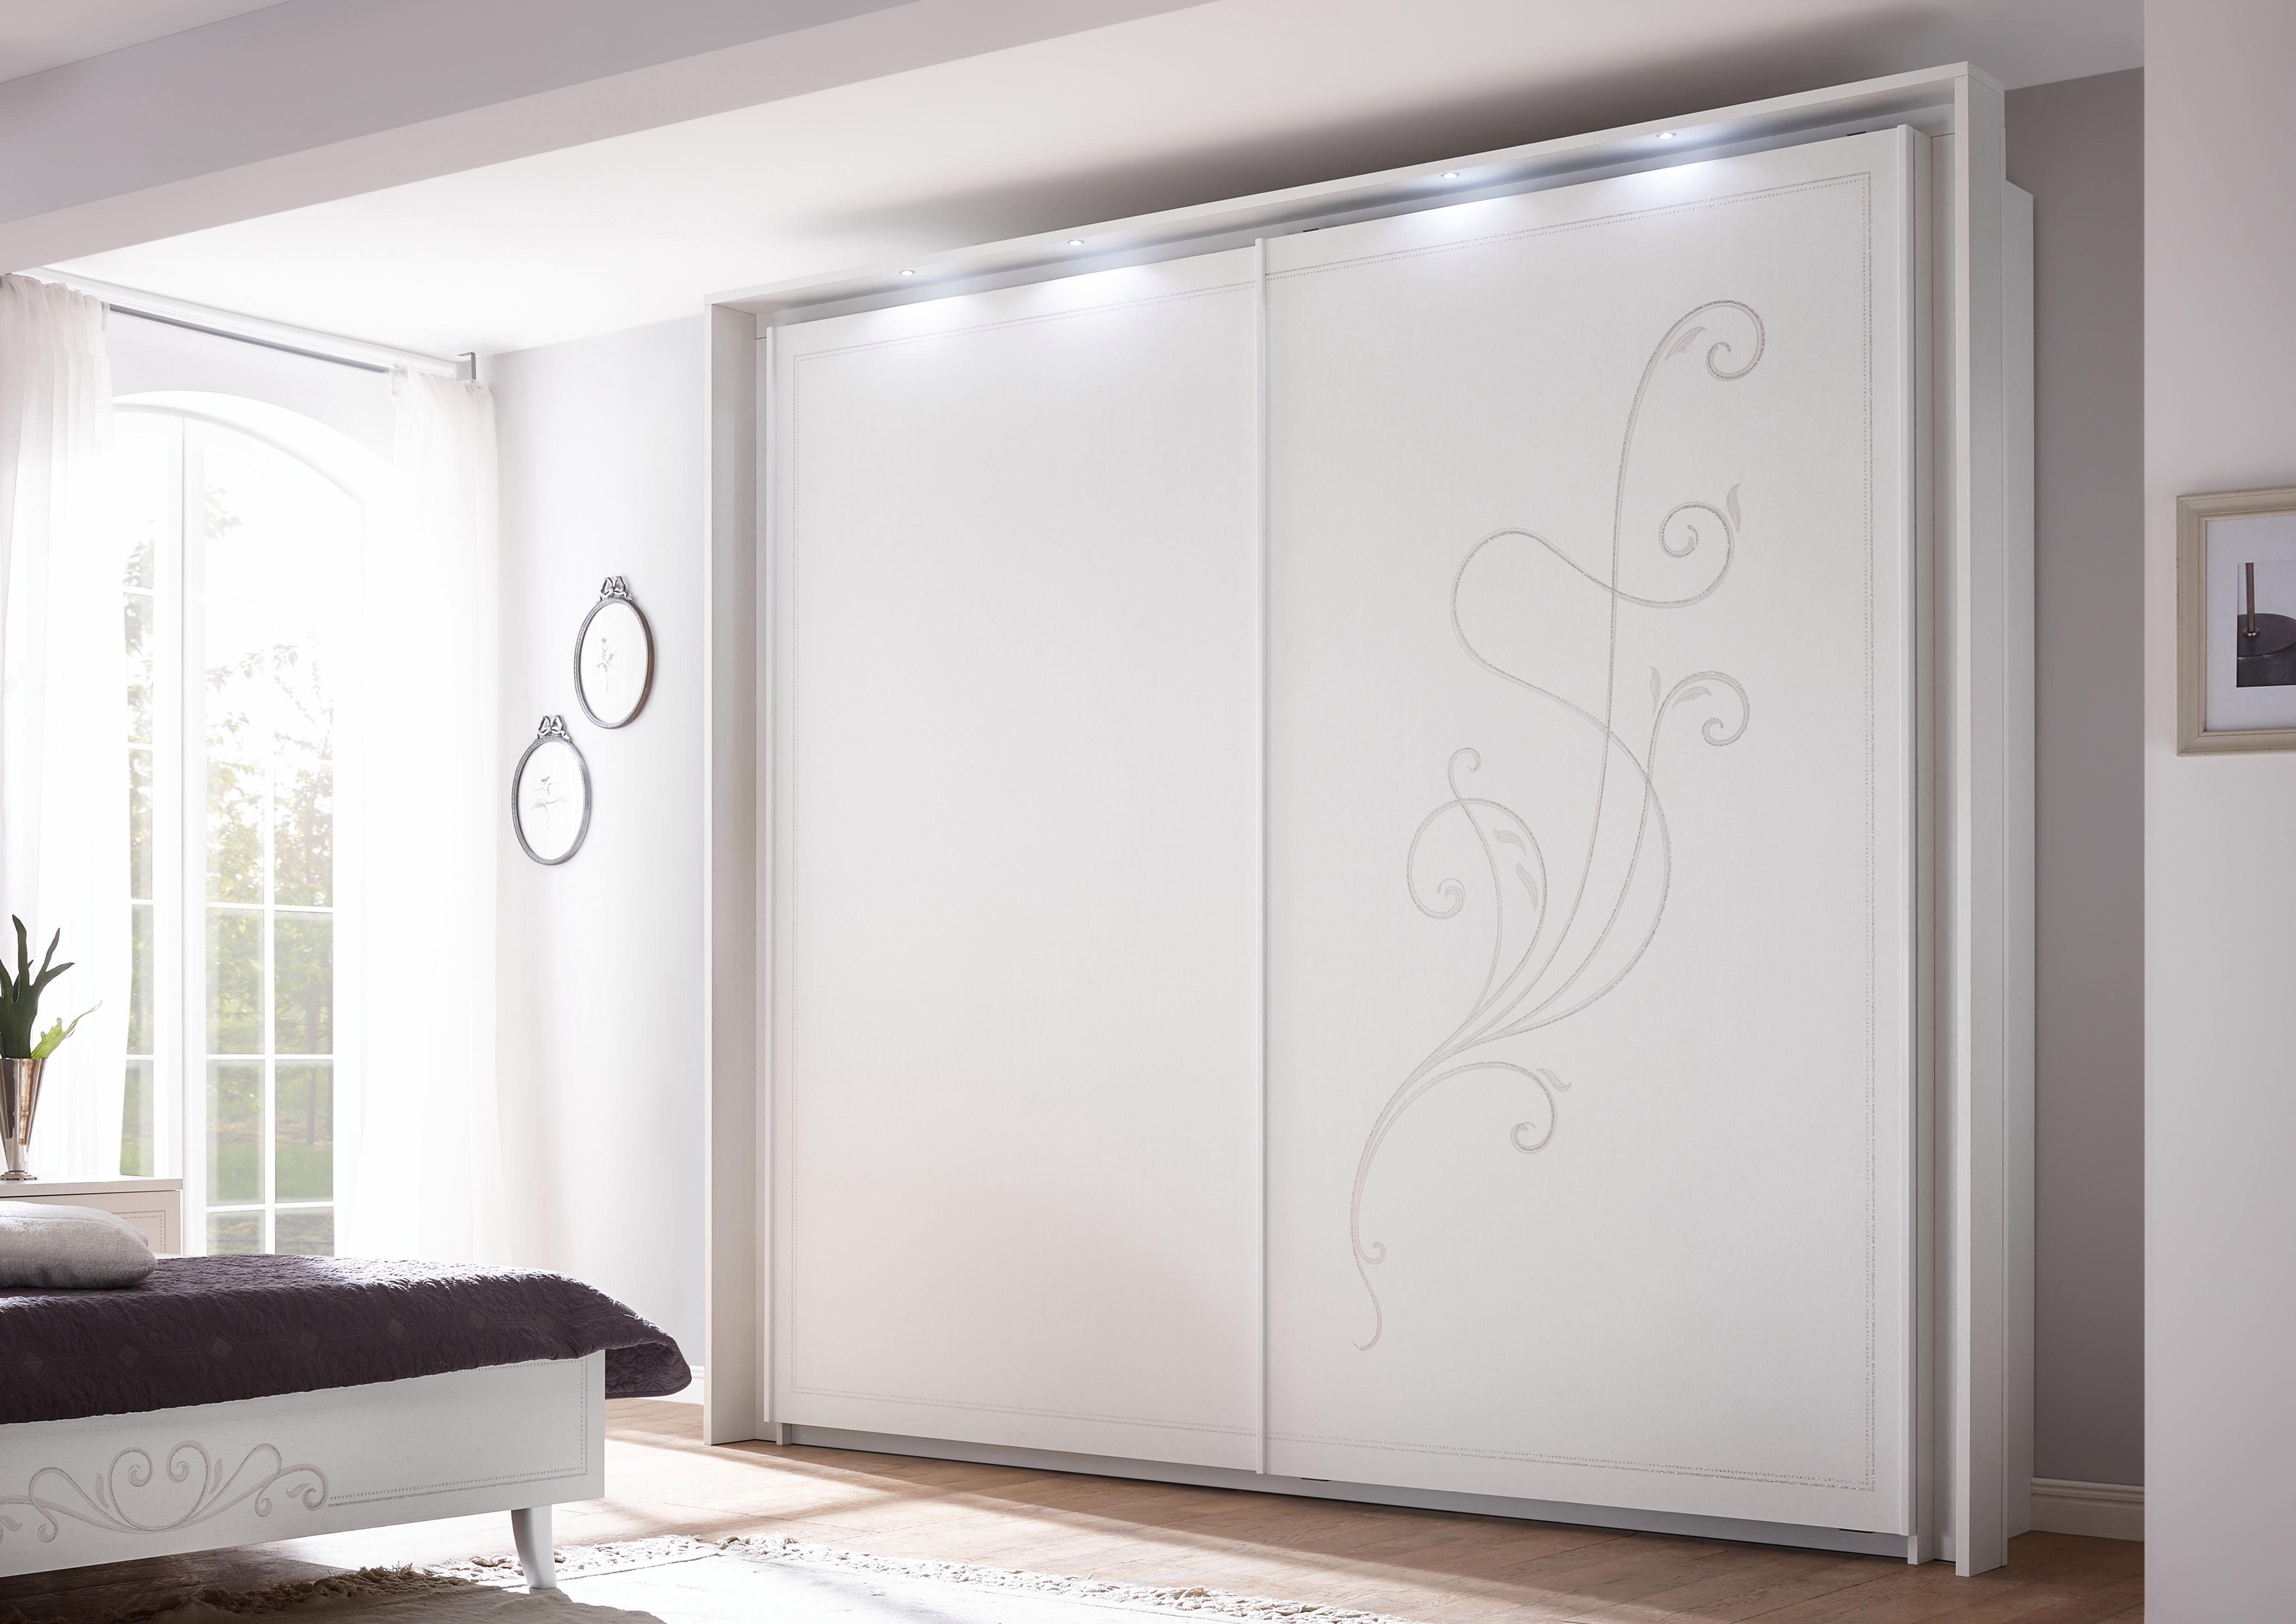 Lc Passepartout Rahmen Tivoli Inkl Led Beleuchtung Bestellen Baur